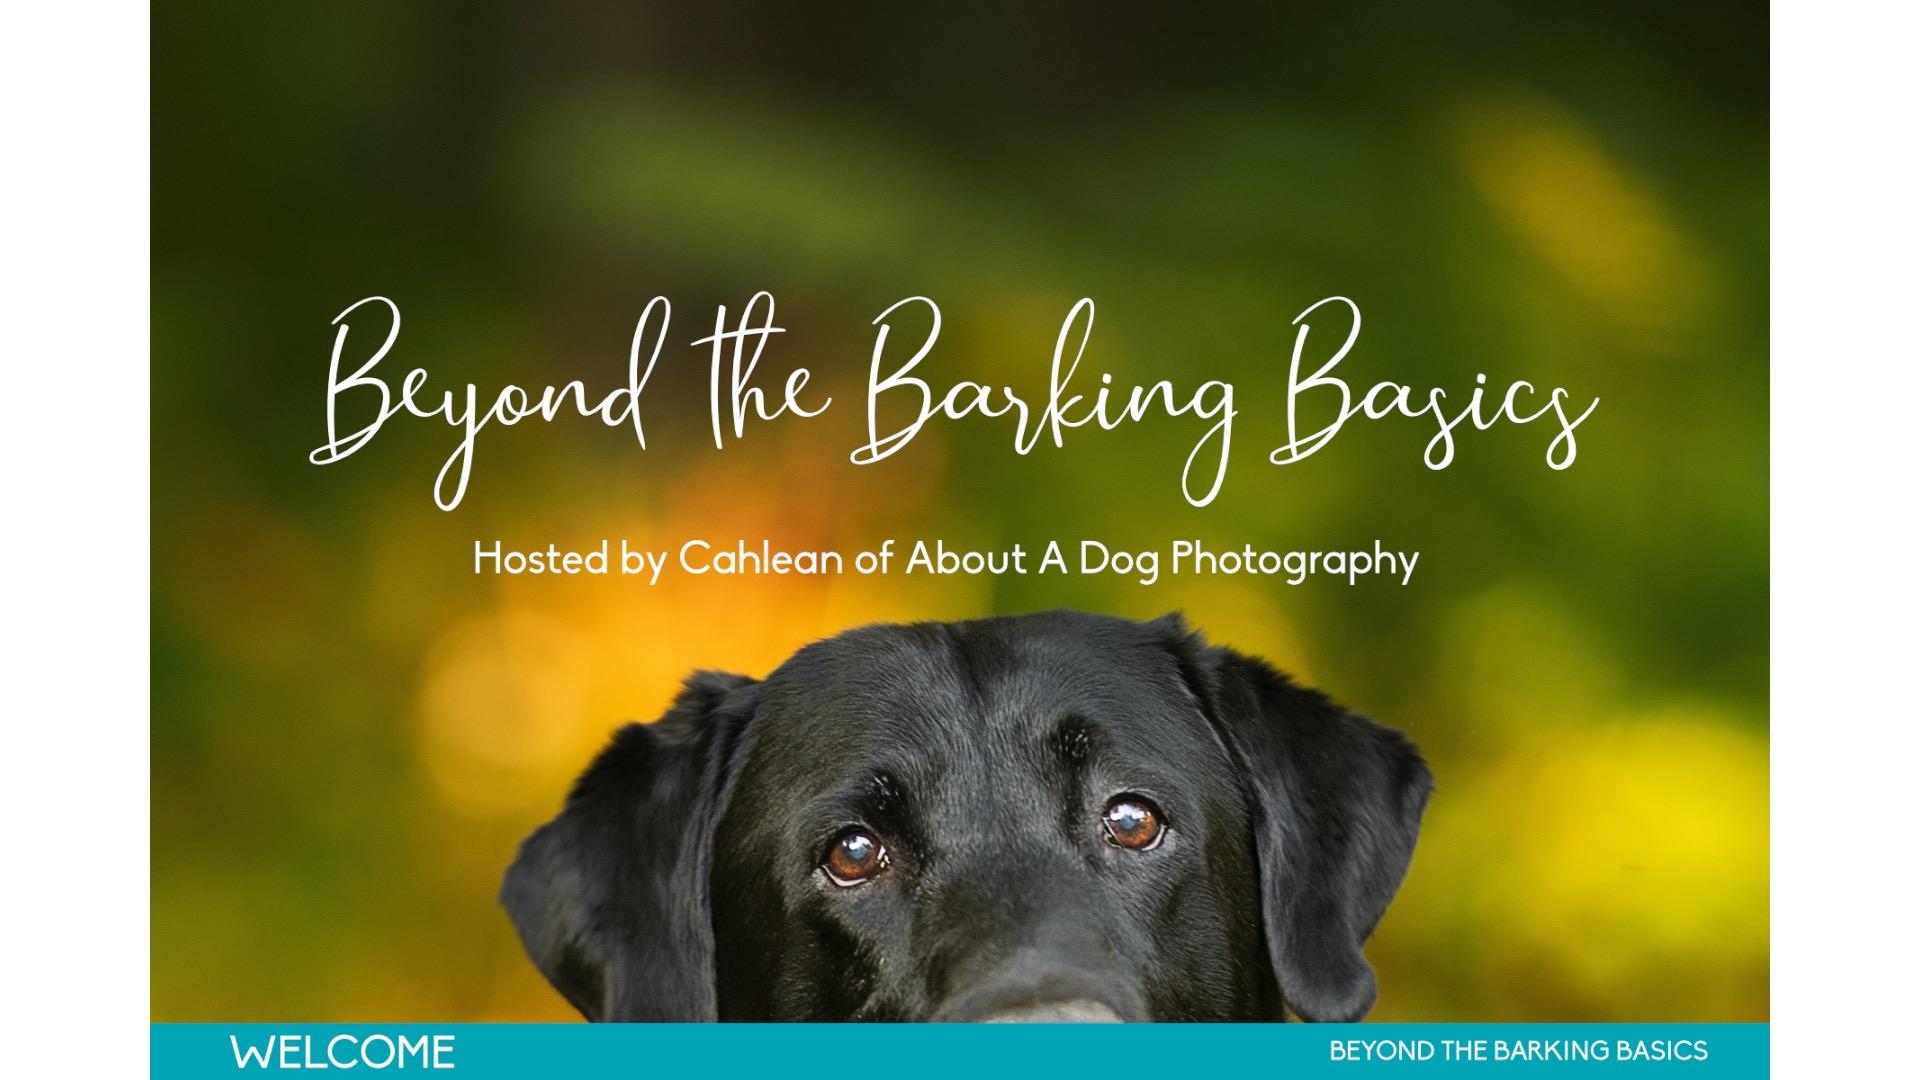 Beyond the Barking Basics